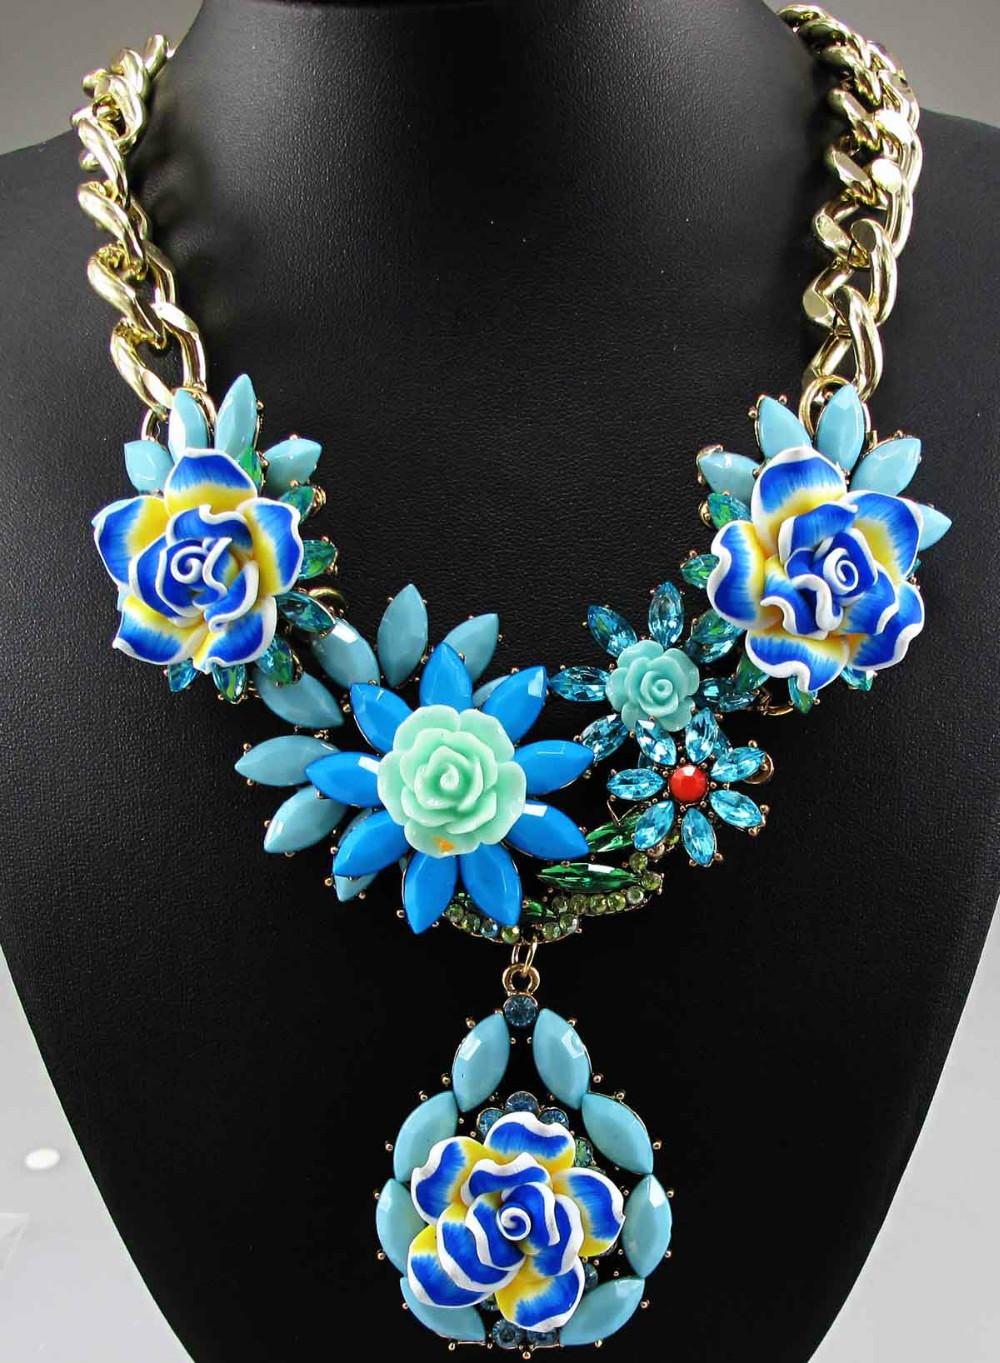 Newest Gorgeous Fashion Necklace Blue Flower Bib Statement Necklace Women Choker Ancient Golden Chain Necklaces & Pendants Q633(China (Mainland))